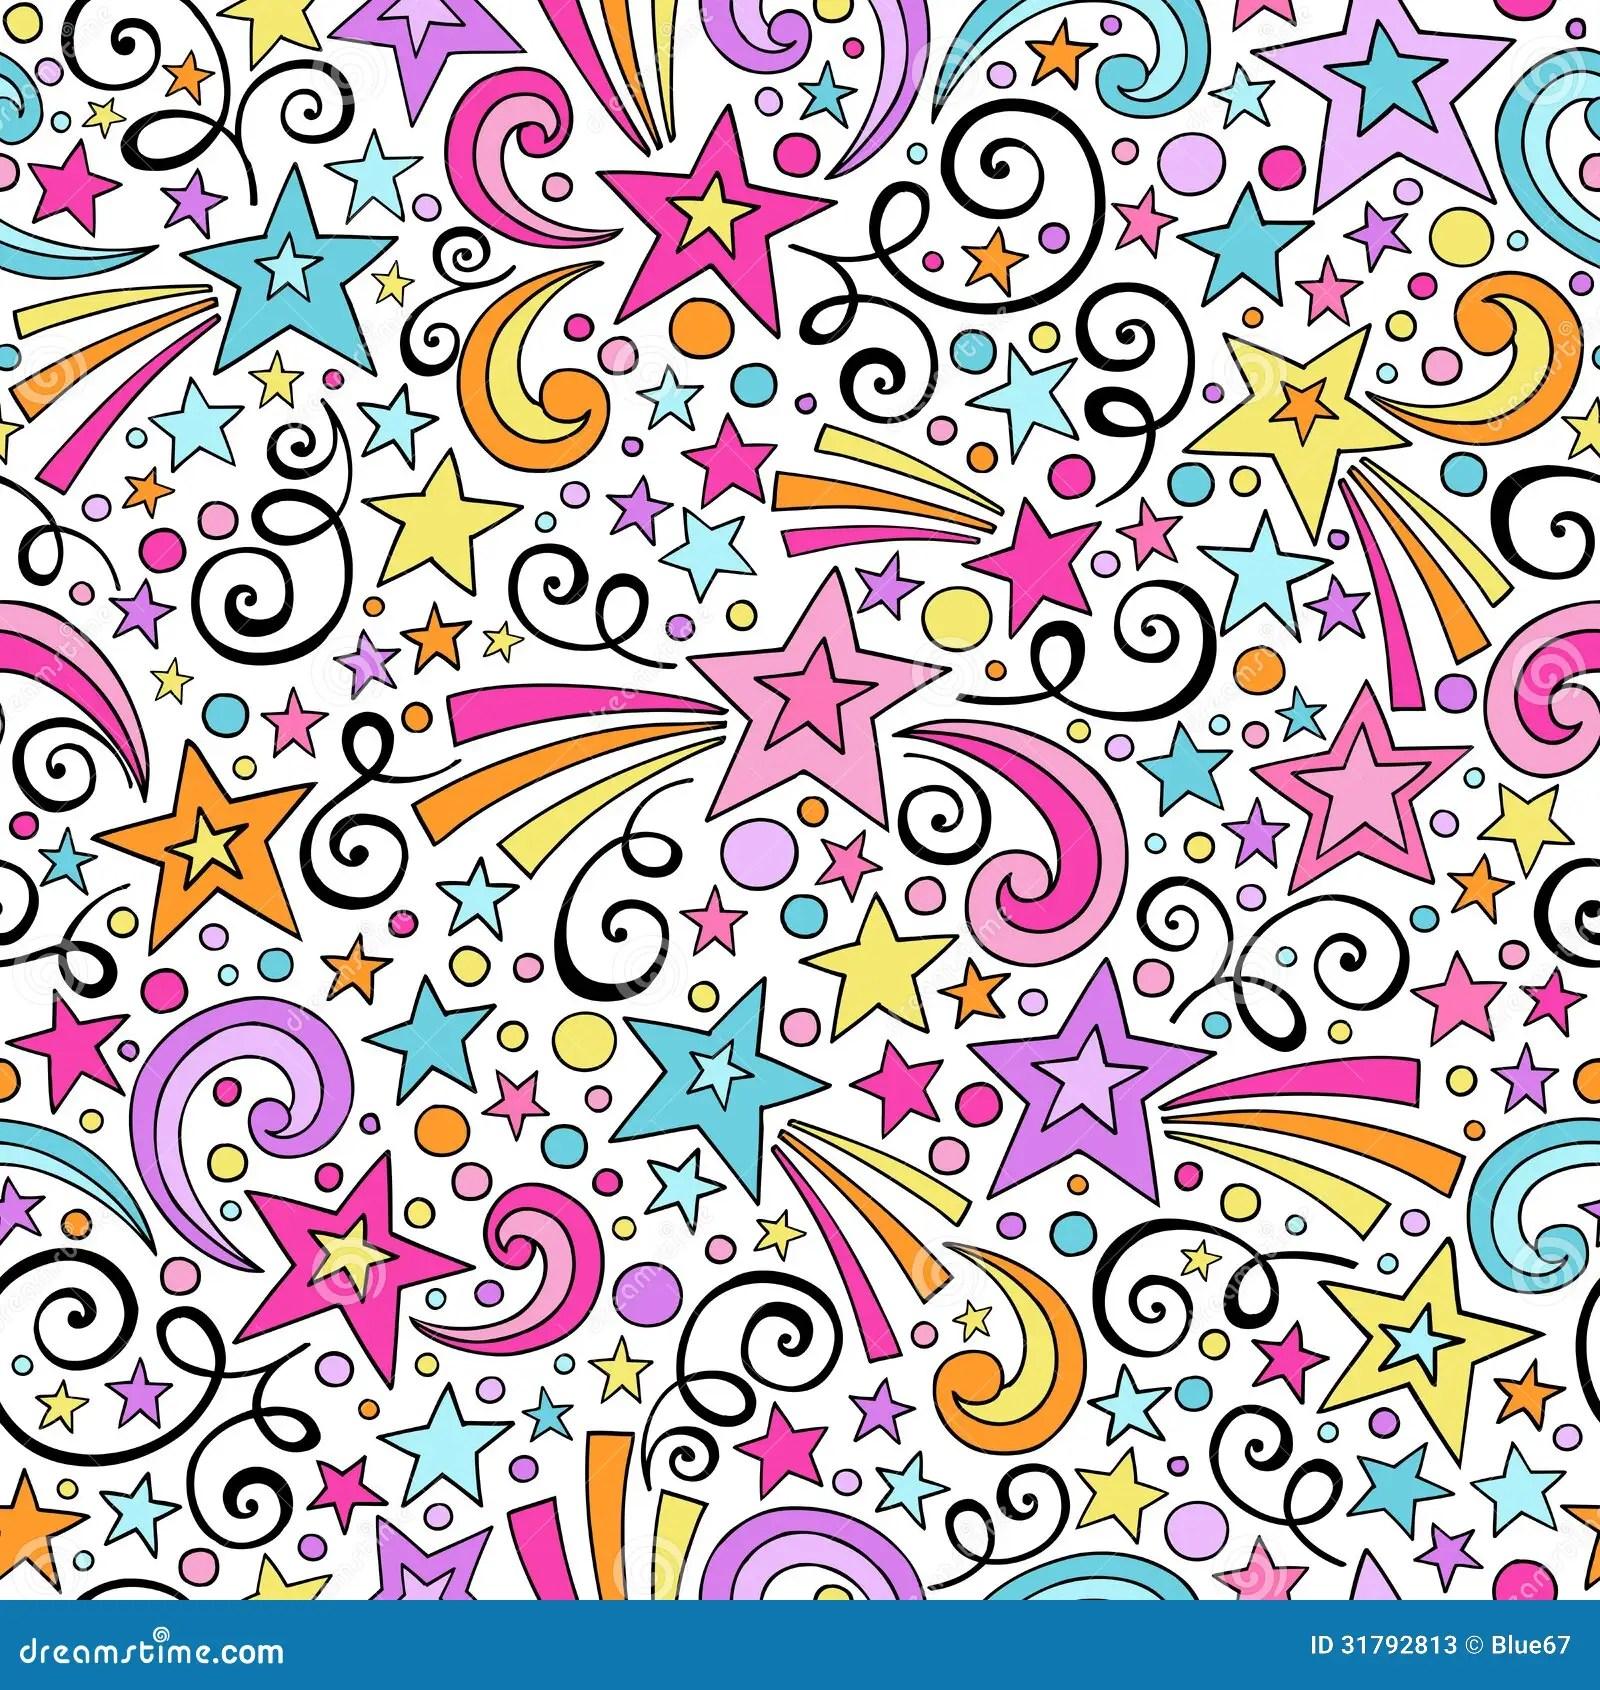 Cute Henna Wallpapers Stars Seamless Pattern Notebook Doodles Vector Stock